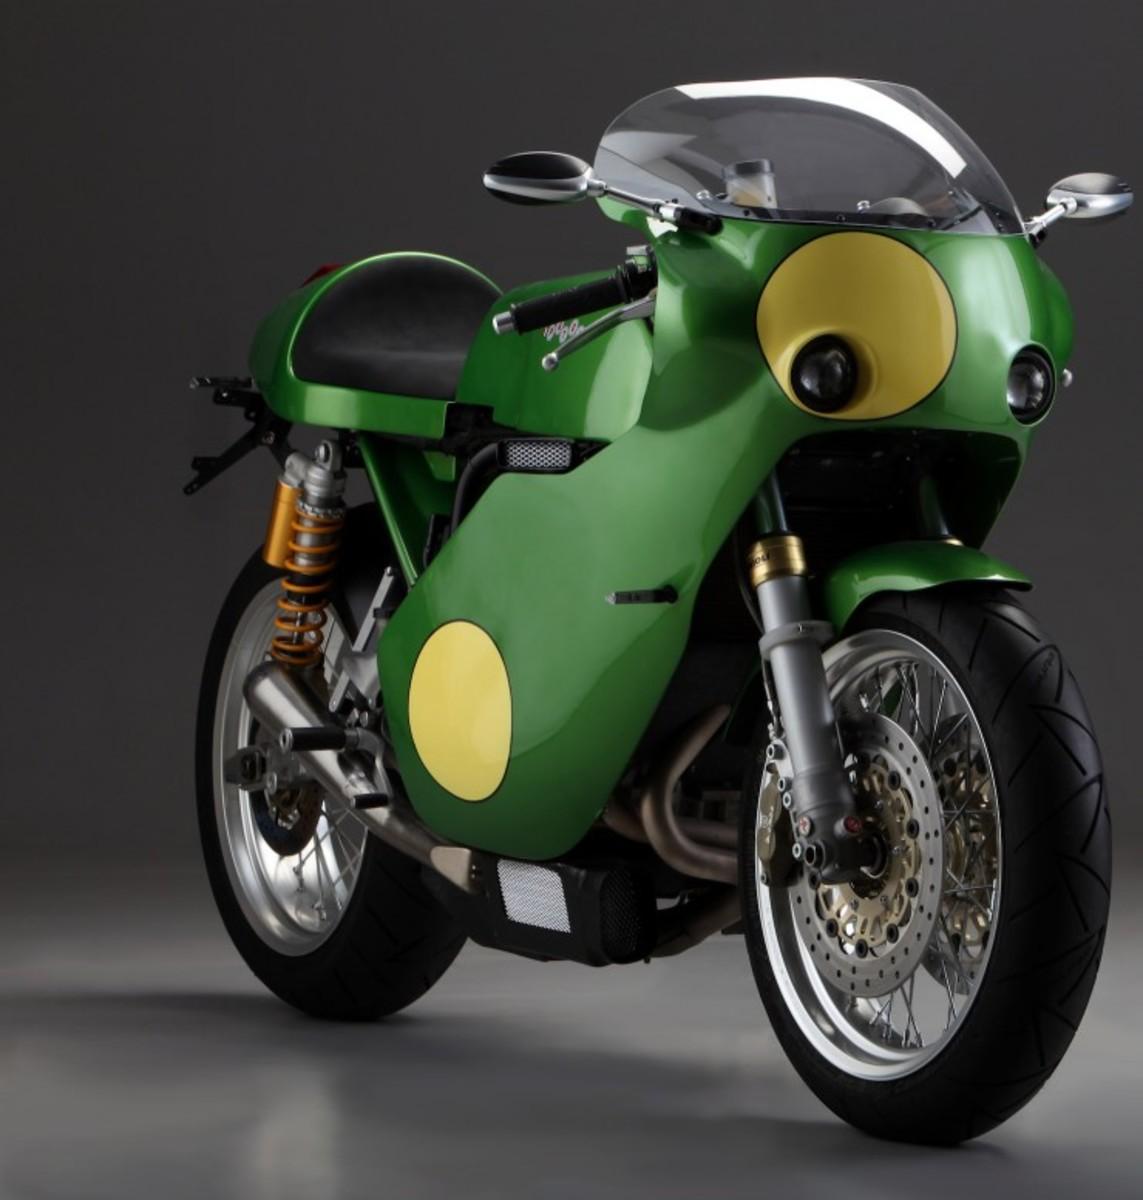 Paton-moto-motorcycle-1-740x777